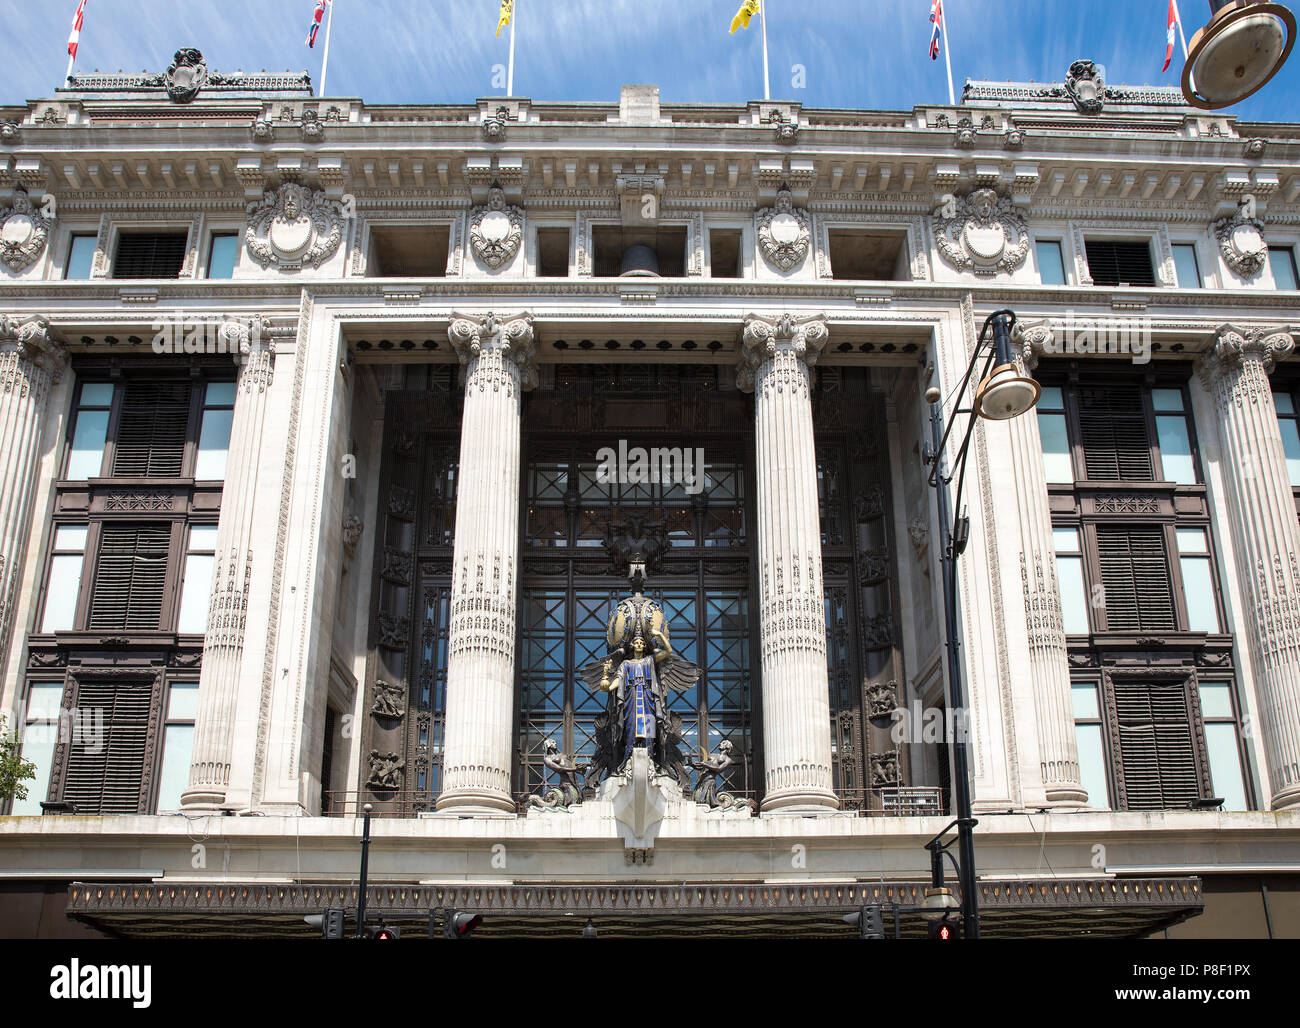 Selfridges in Oxford Street, London. - Stock Image